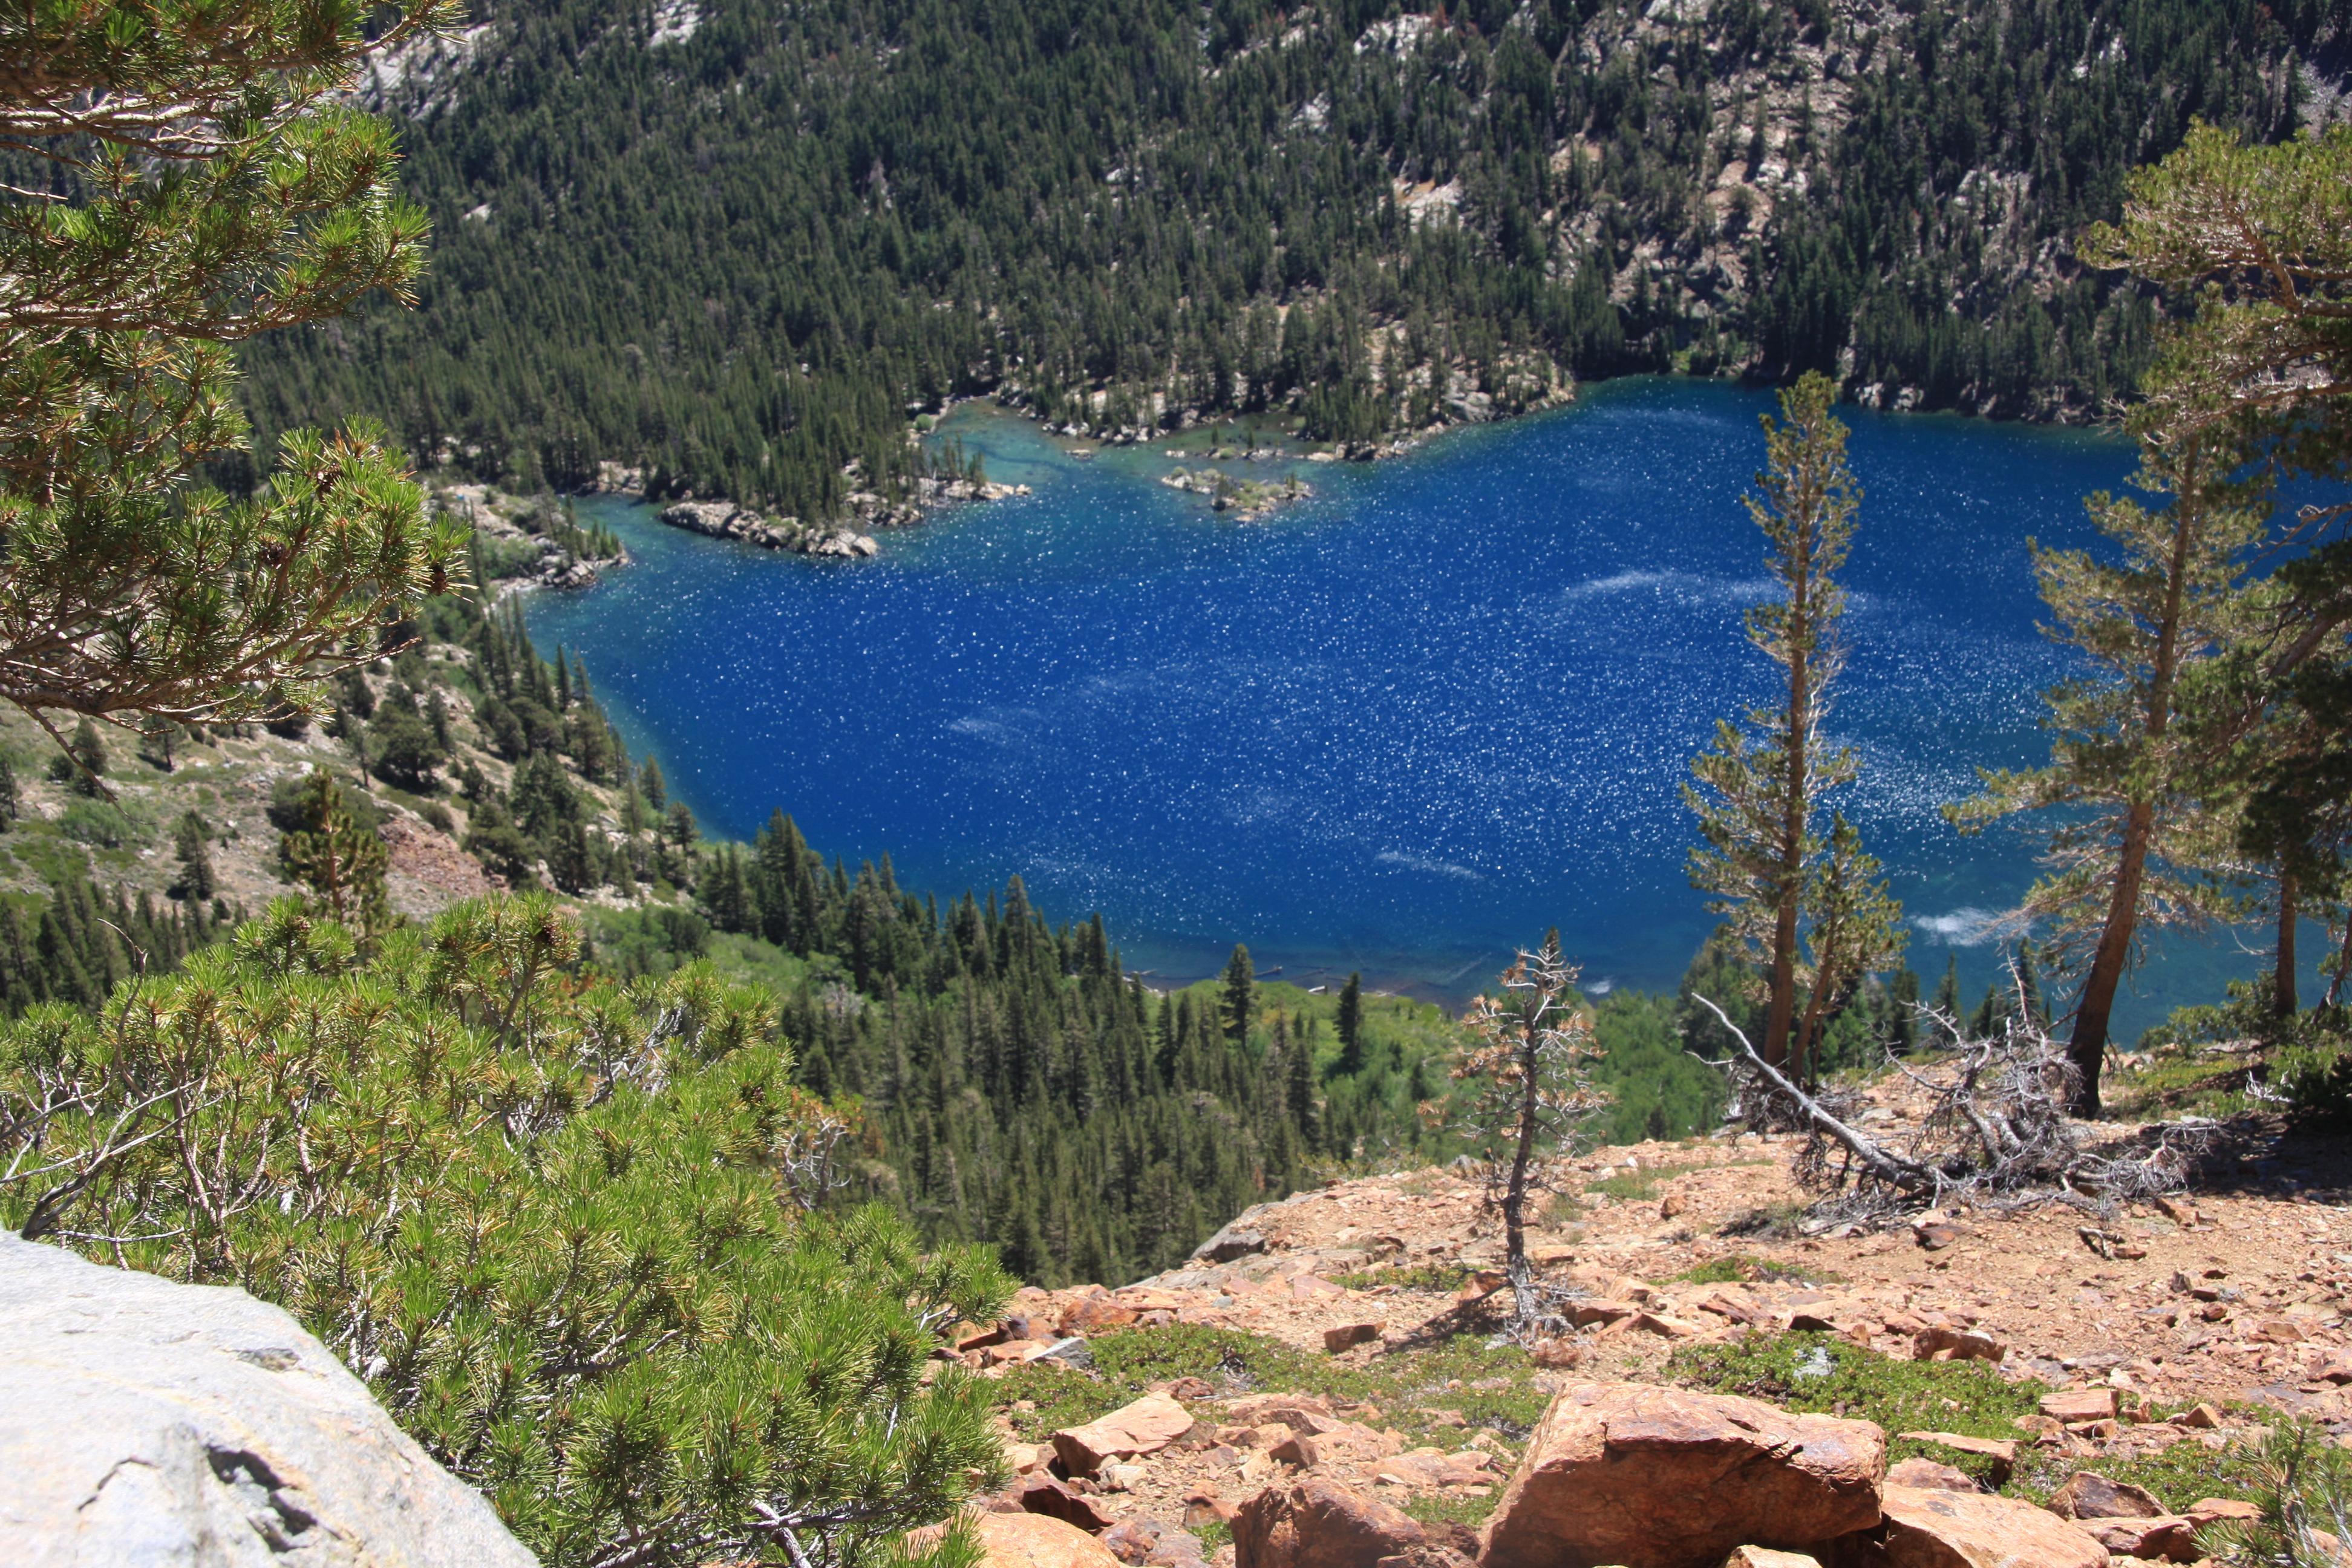 File:Green Lake from rim of West Lake jpg - Wikimedia Commons